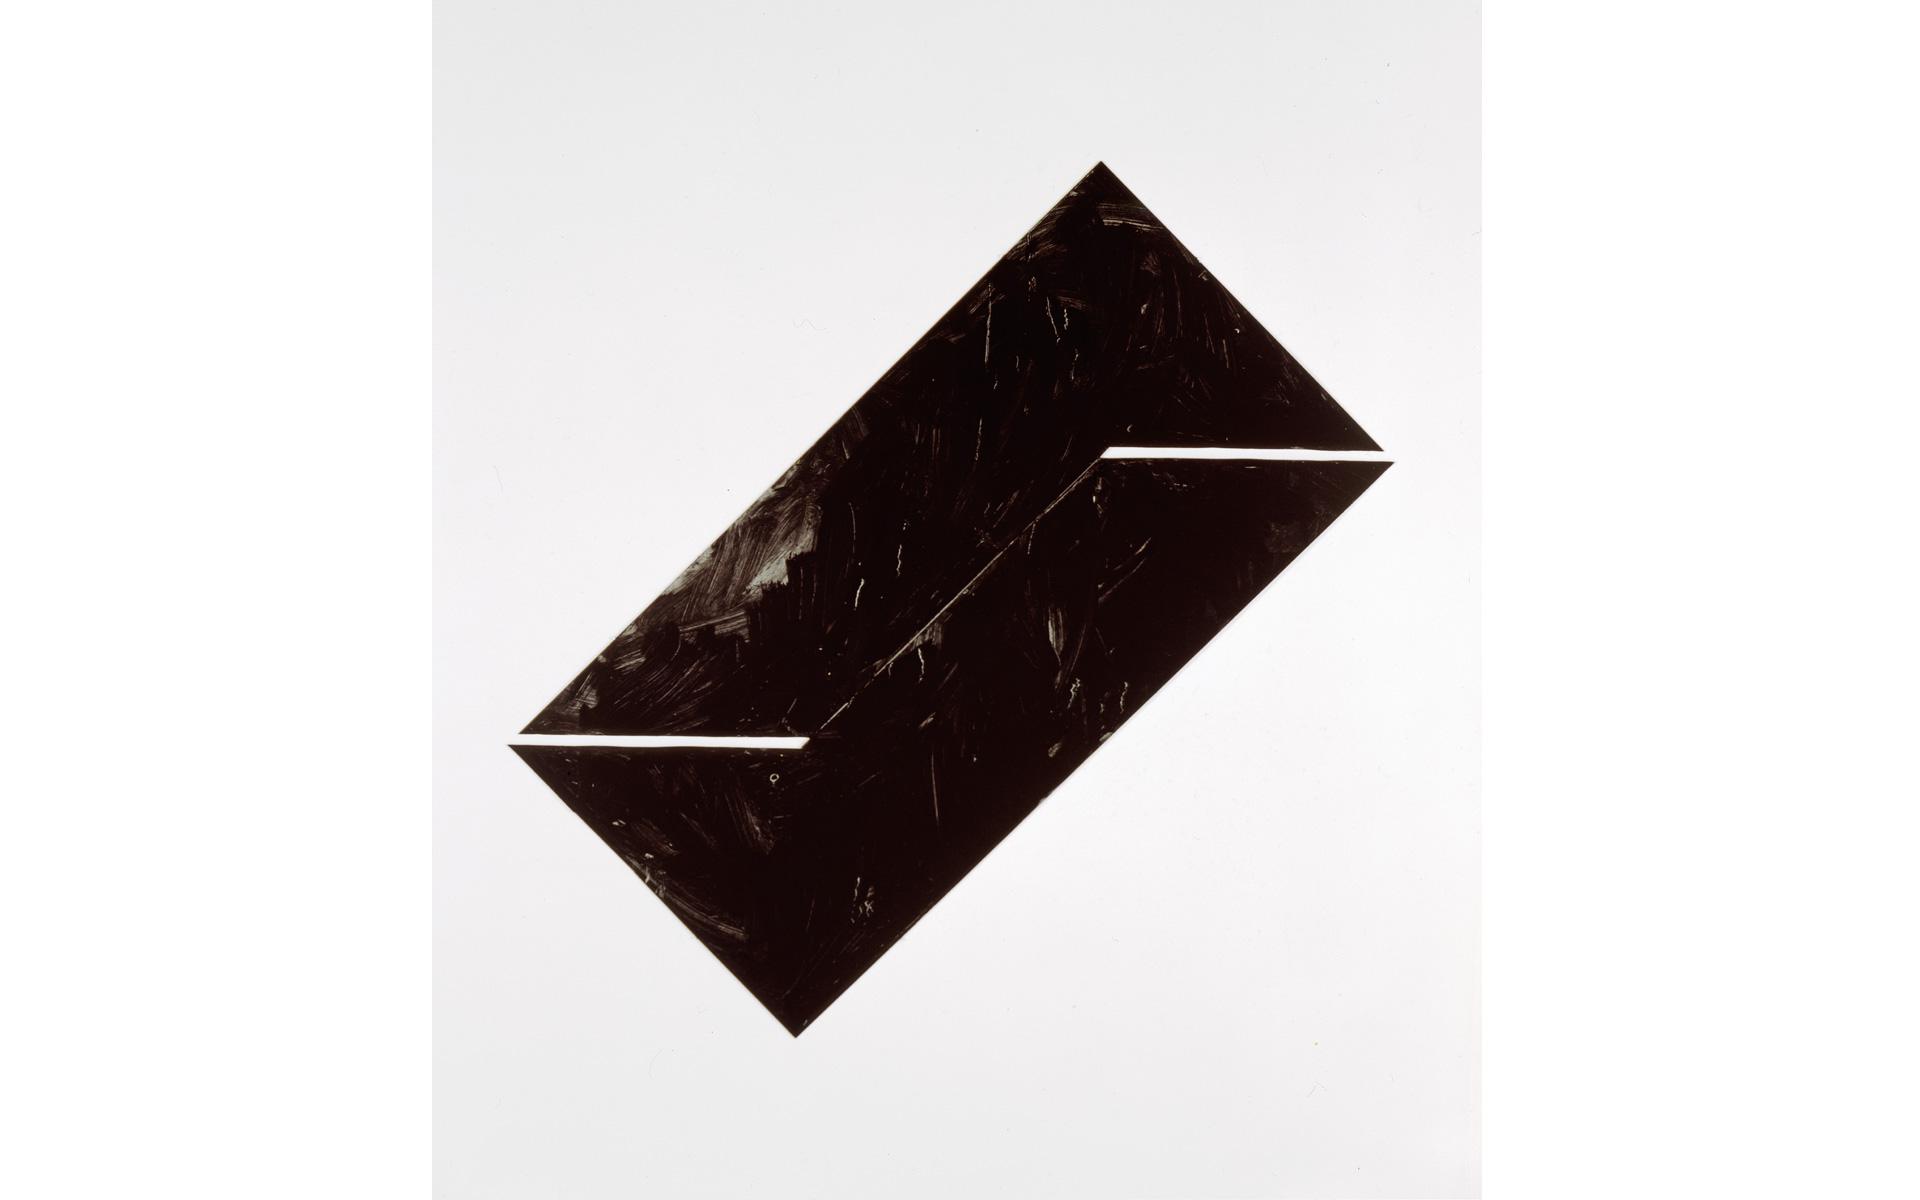 Schnitt, 1987 Oil on steel 90 × 90 × 0.1 cm - Photo: Christoph Valentien